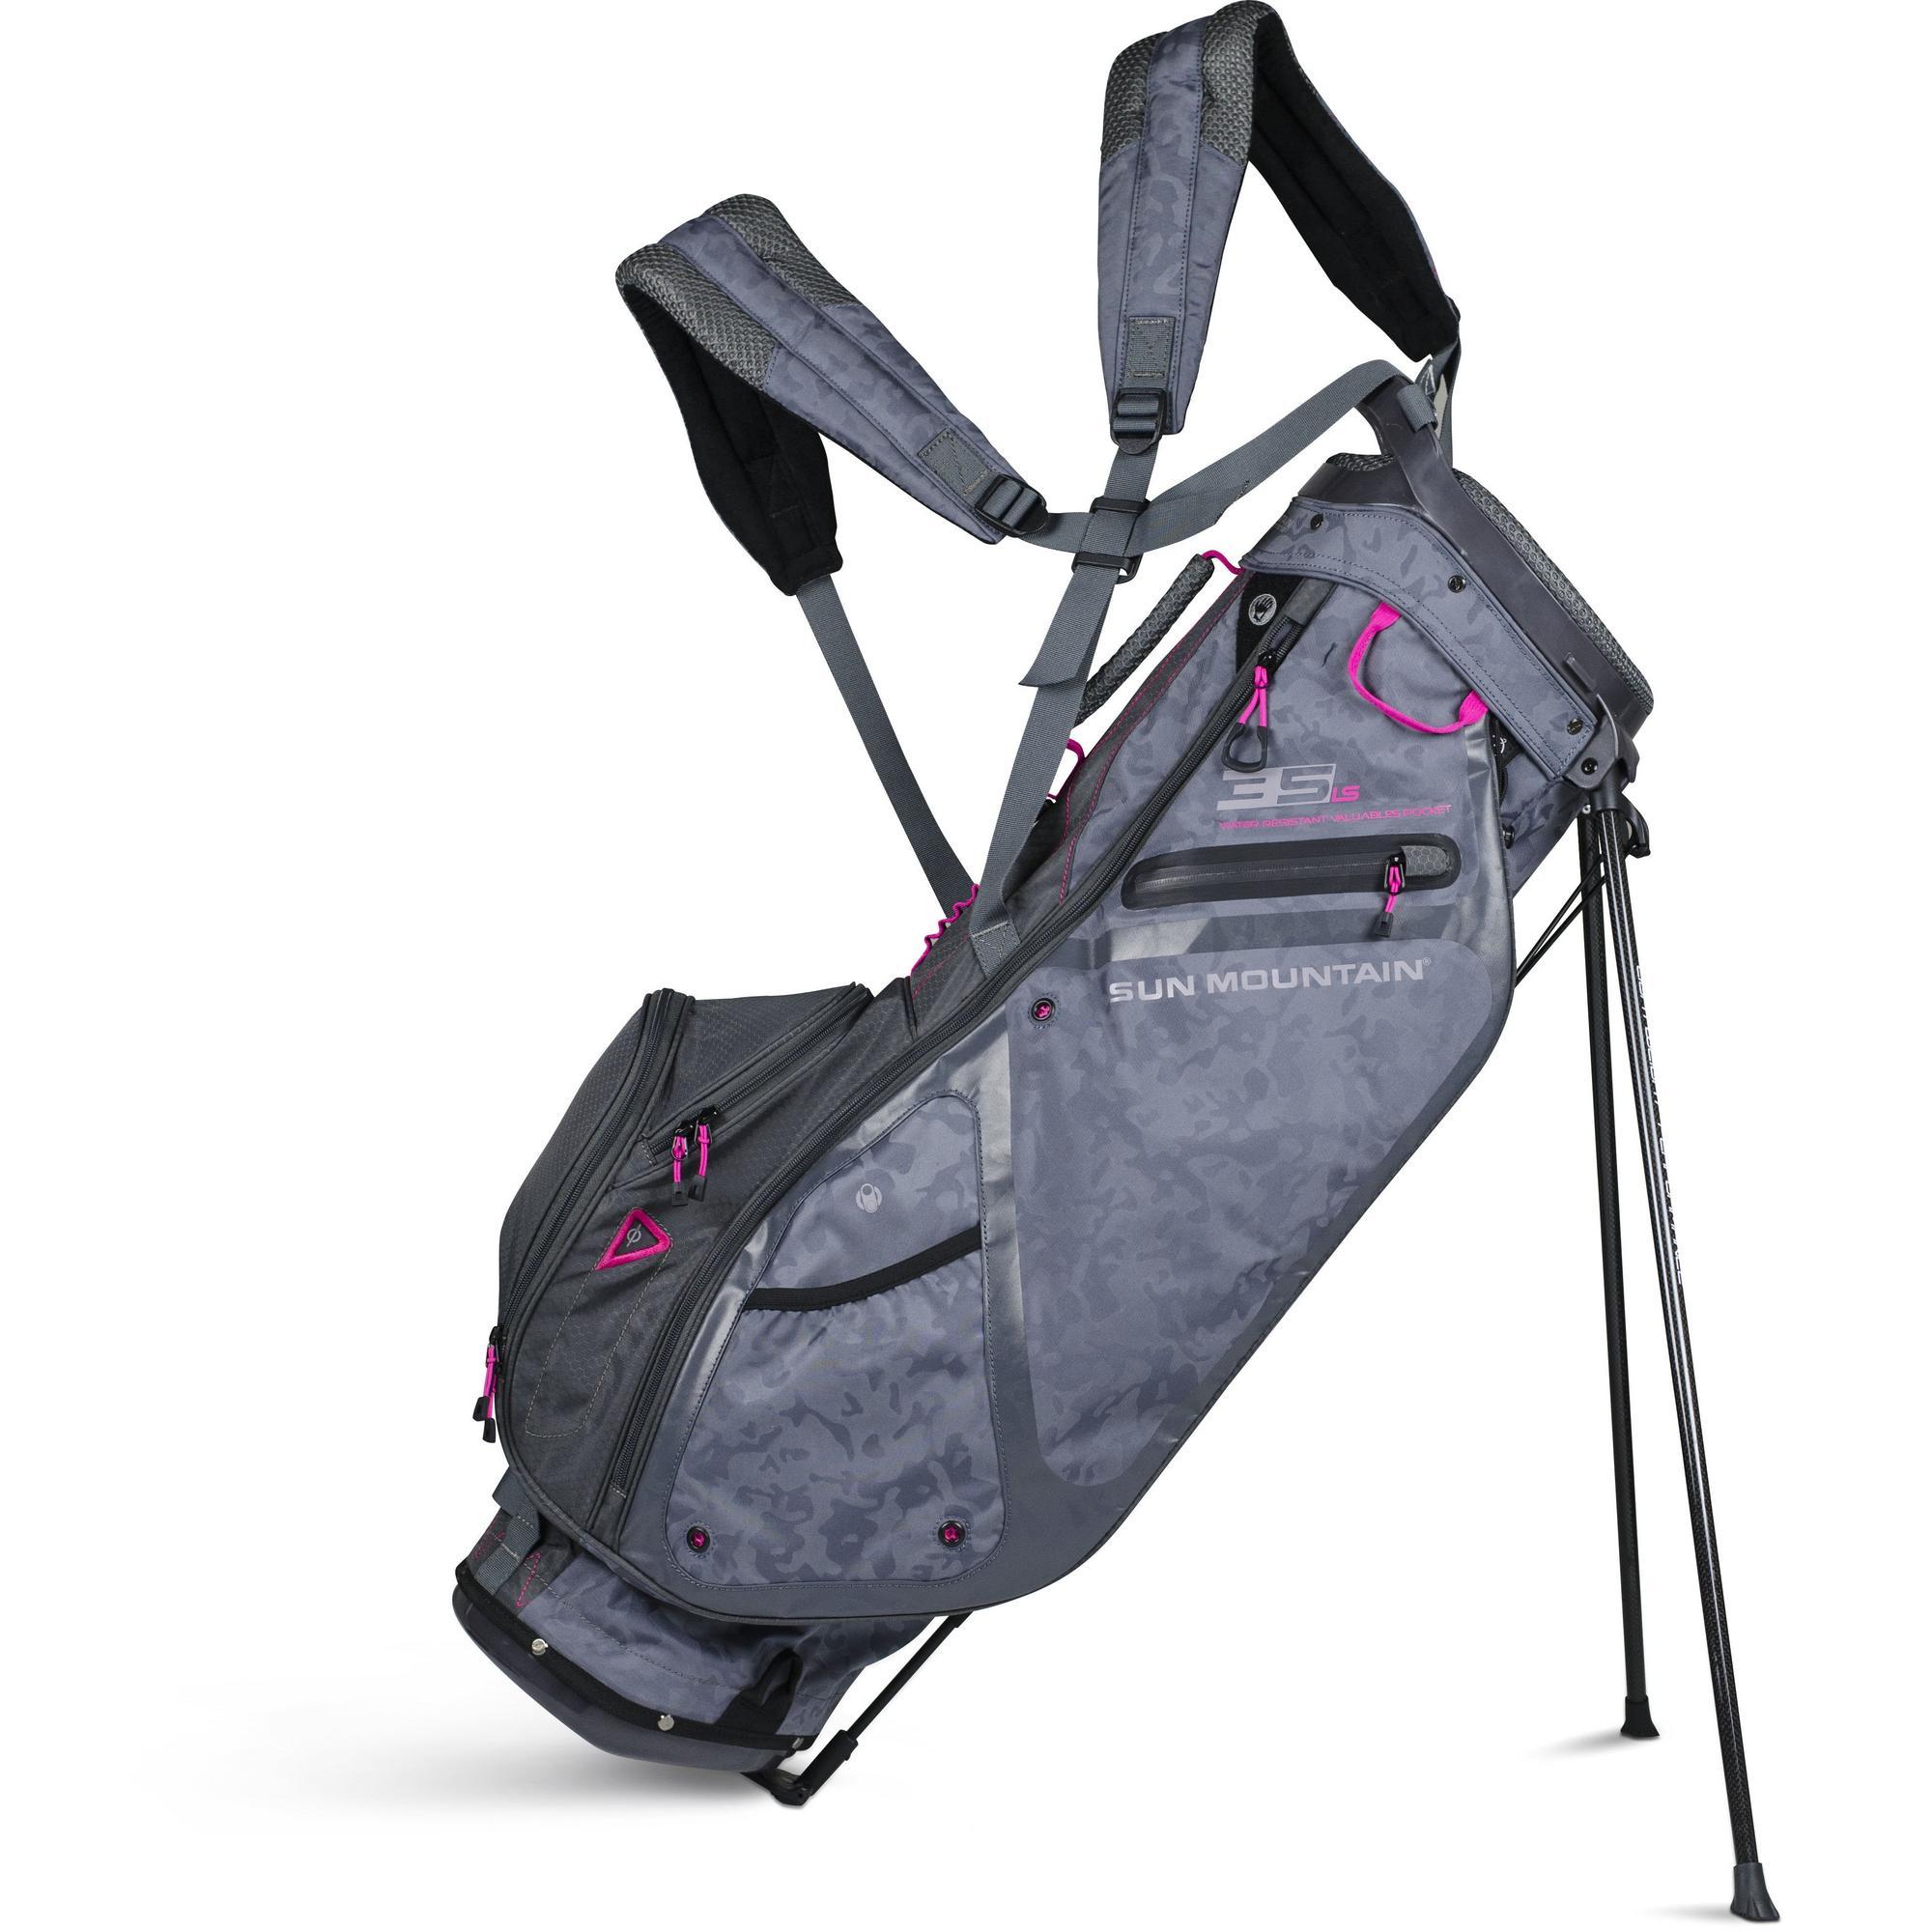 2018 Women's 3.5 LS Stand Bag